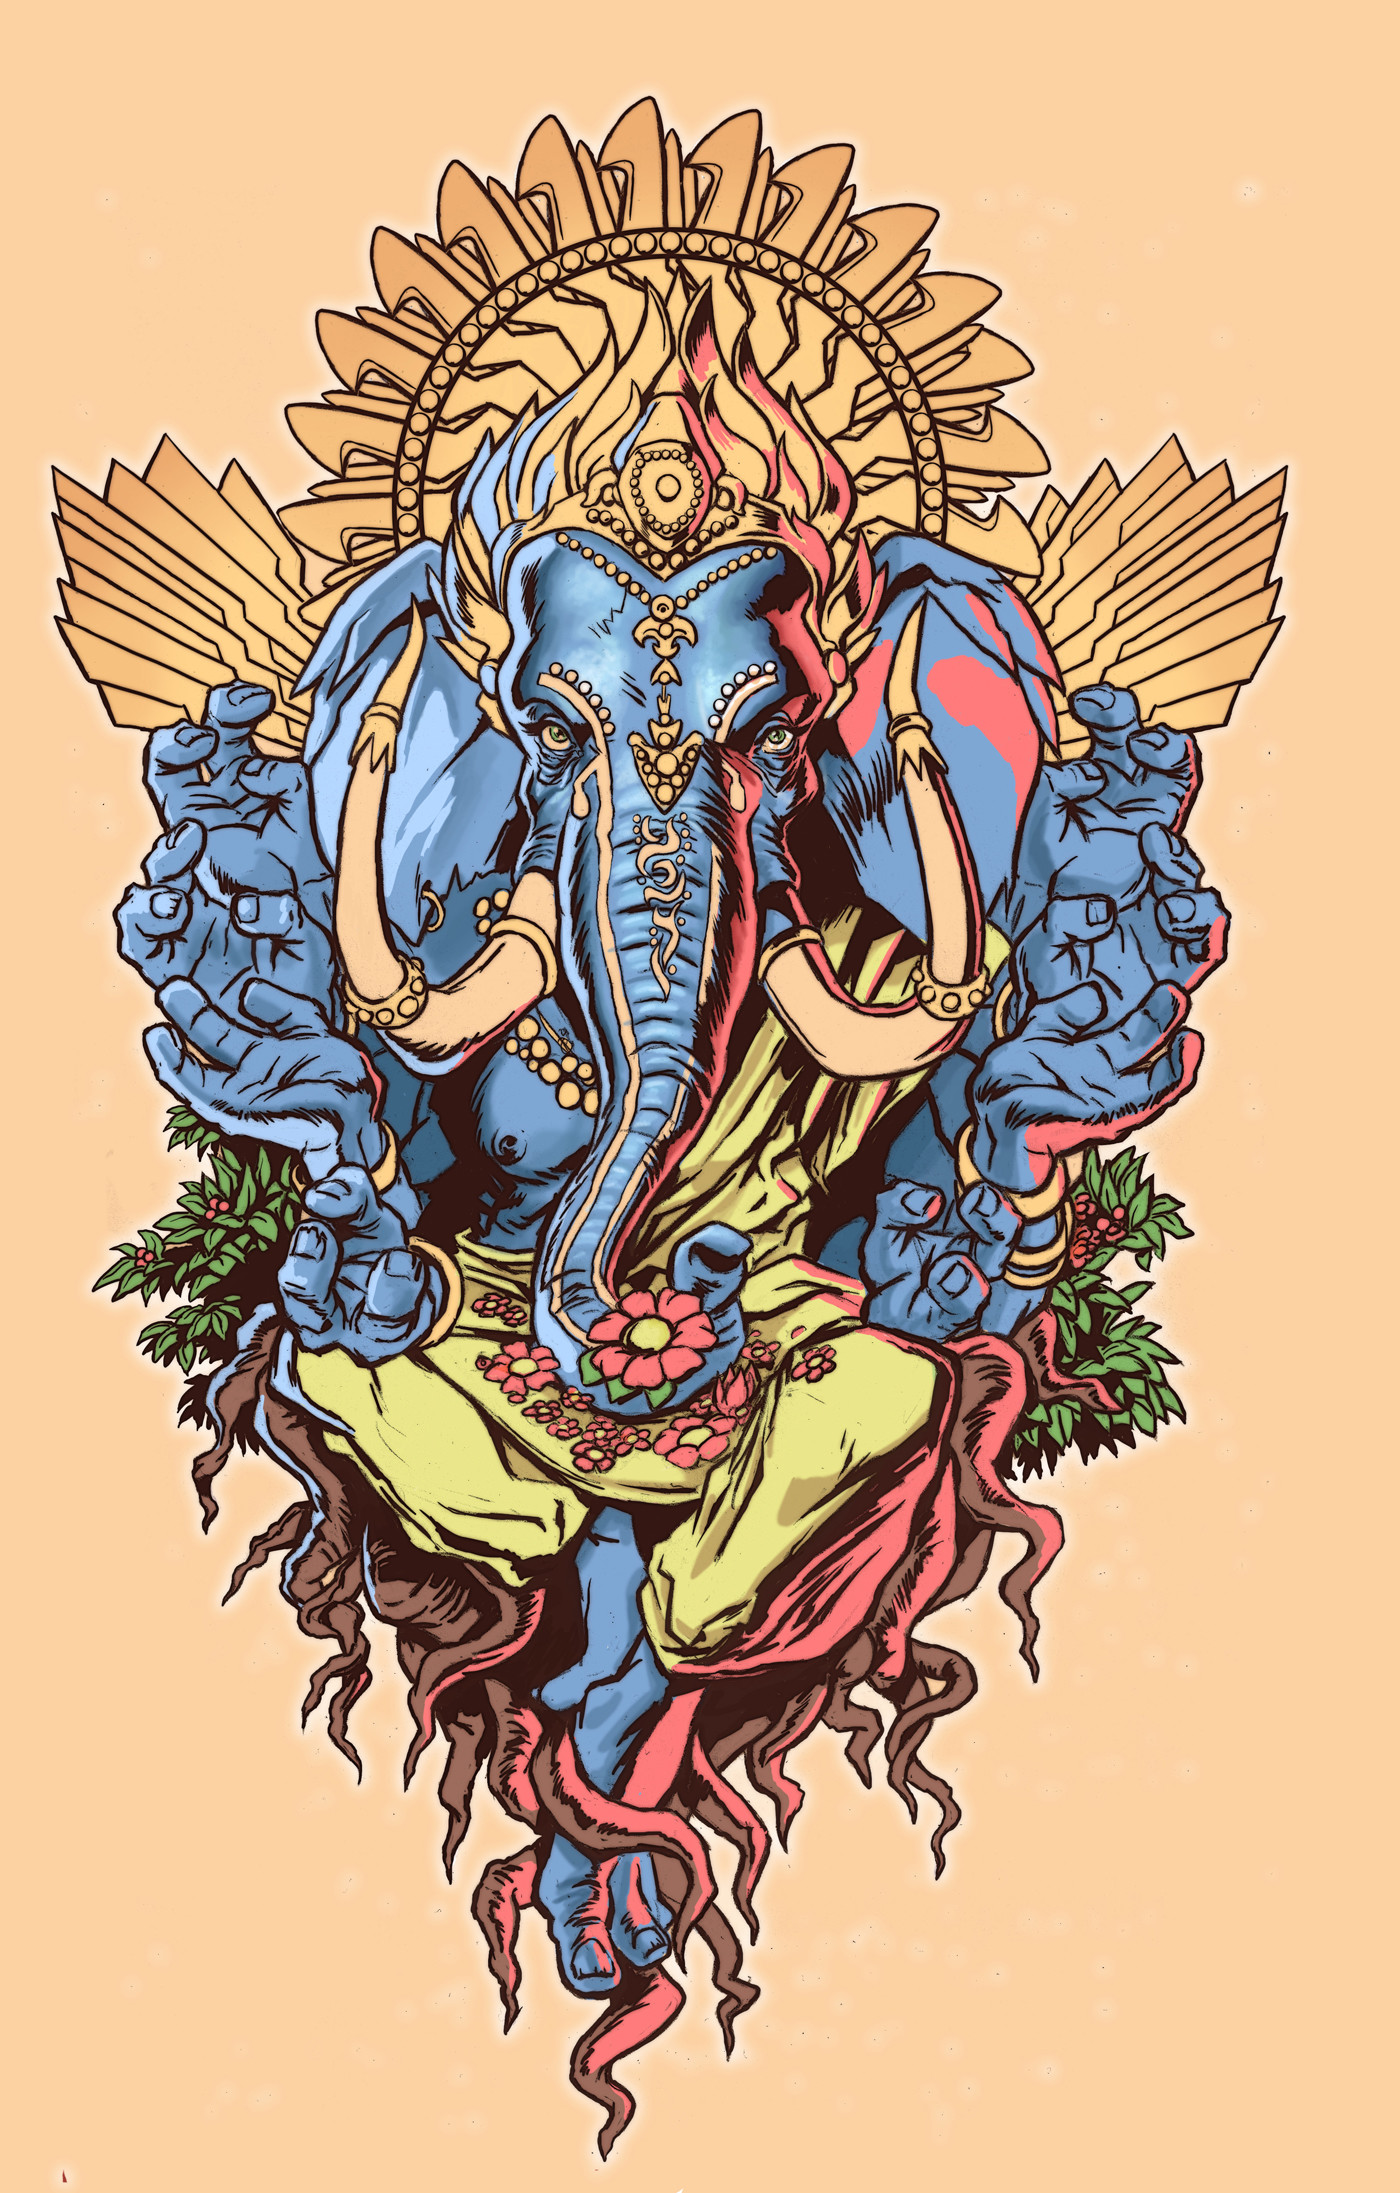 Tattoo Design Wallpaper 41 Images